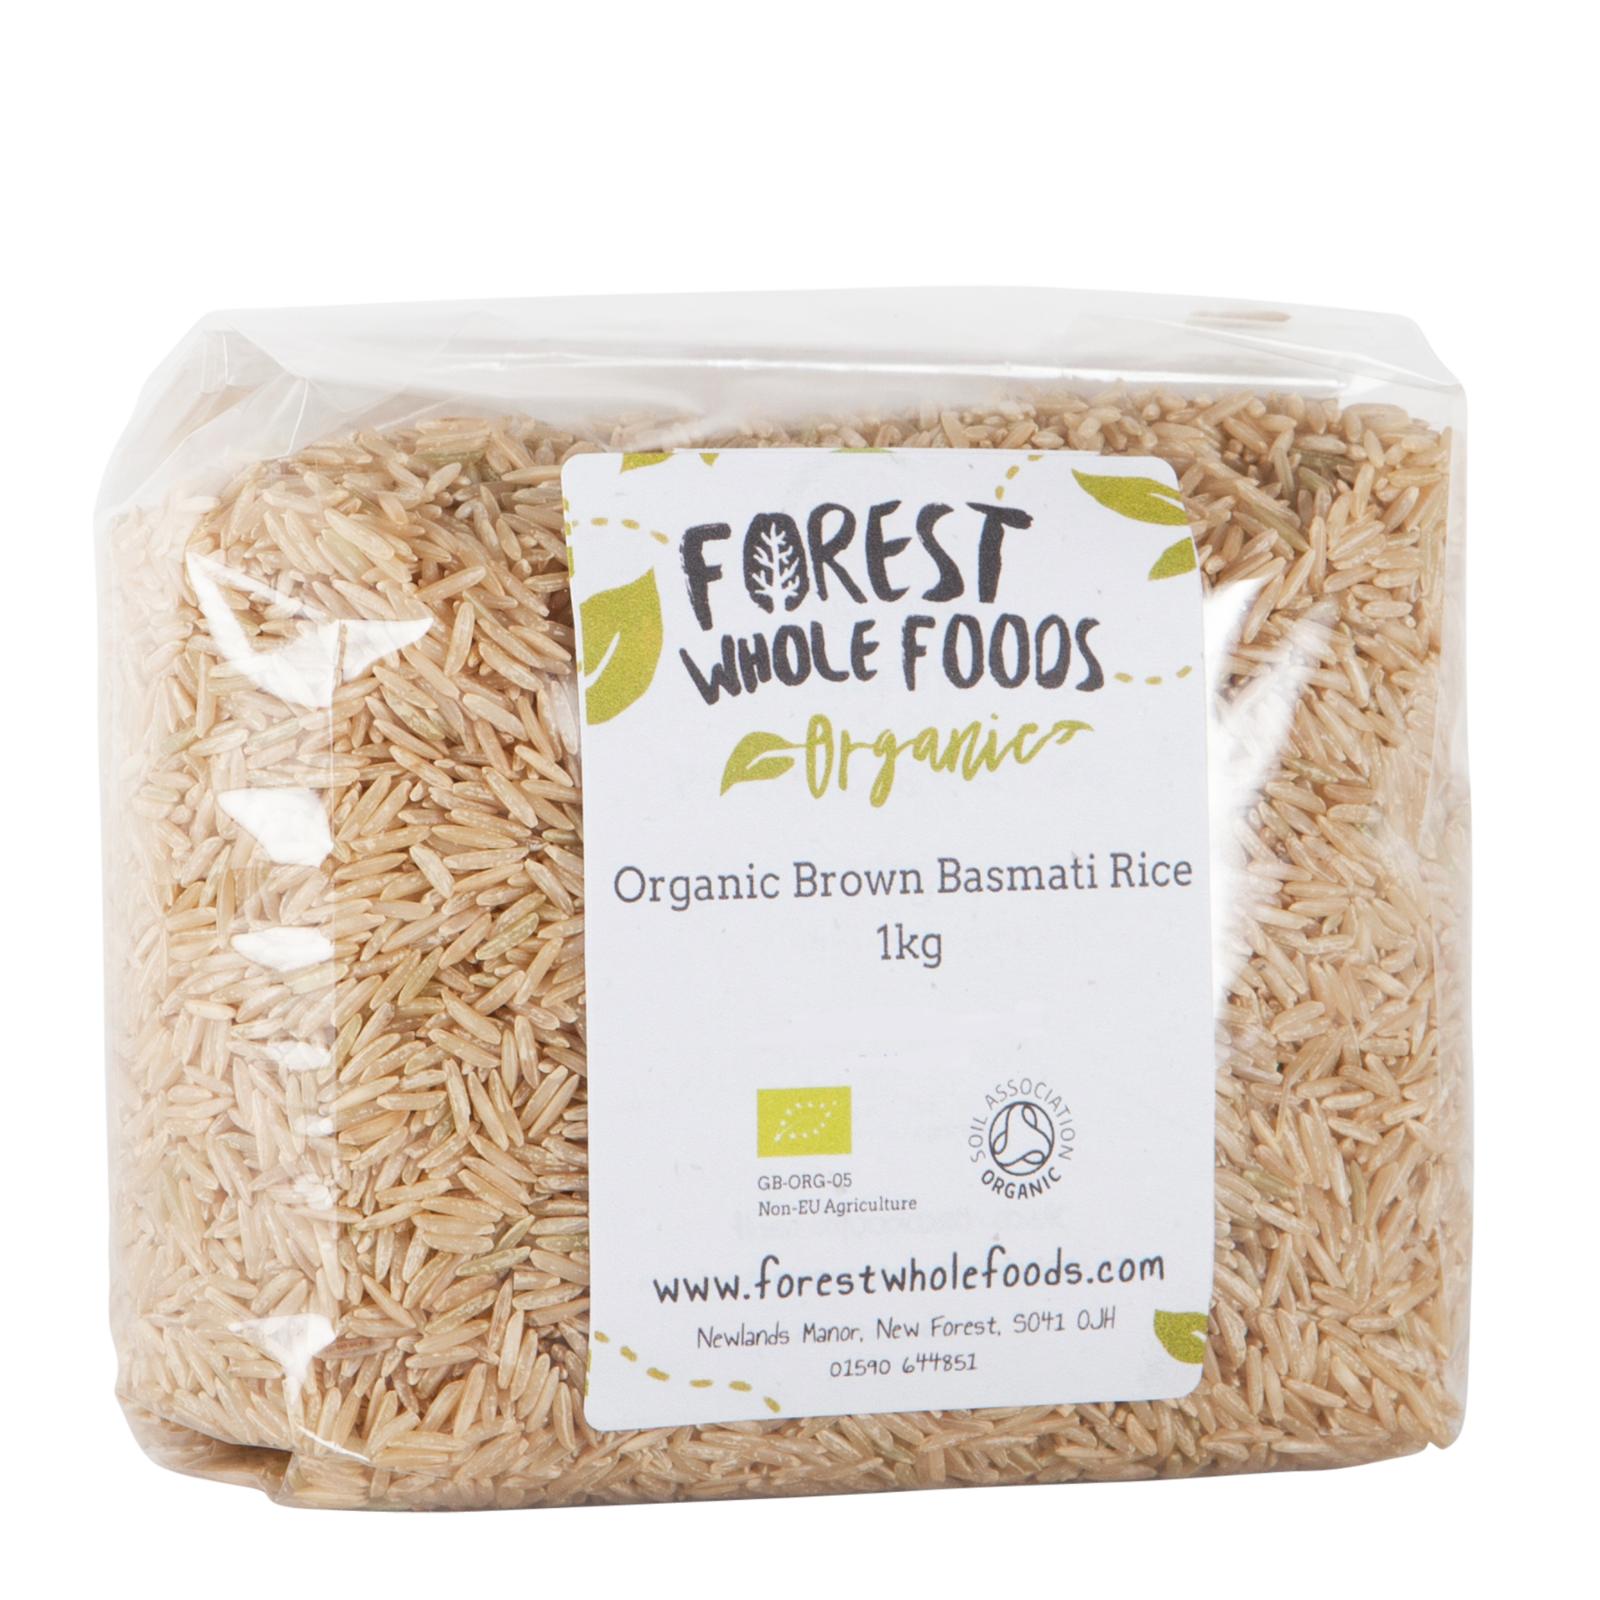 Forest Whole Foods - Organico Marronee Basmati Riso